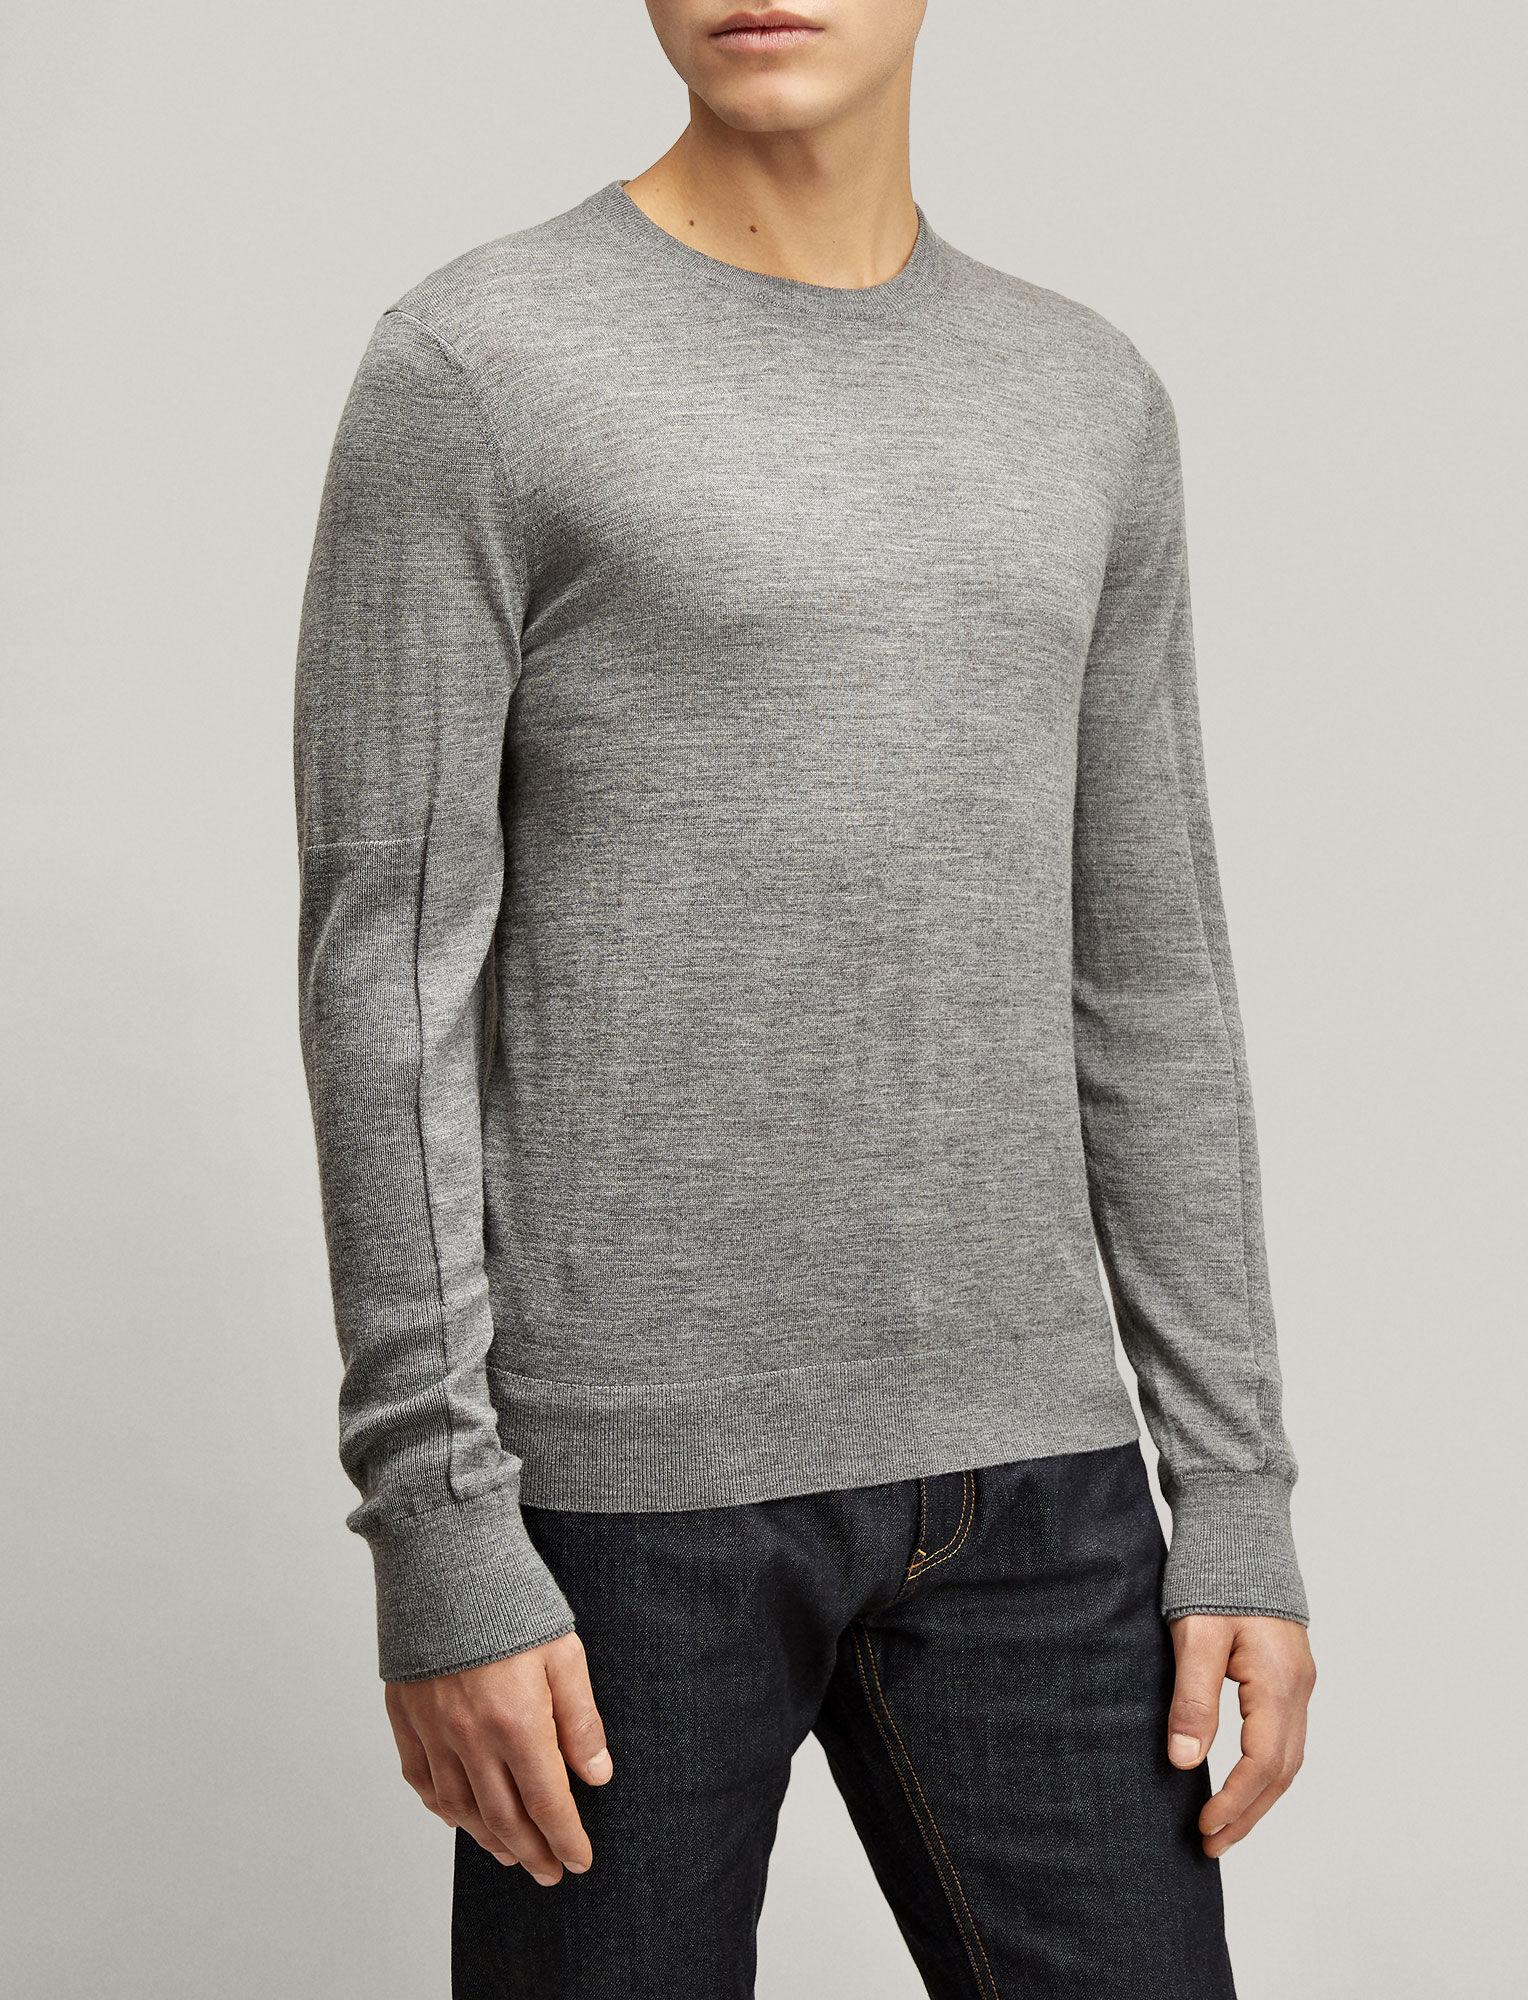 Joseph, Merinos + Rib Patch Sweater, in GRAPHITE